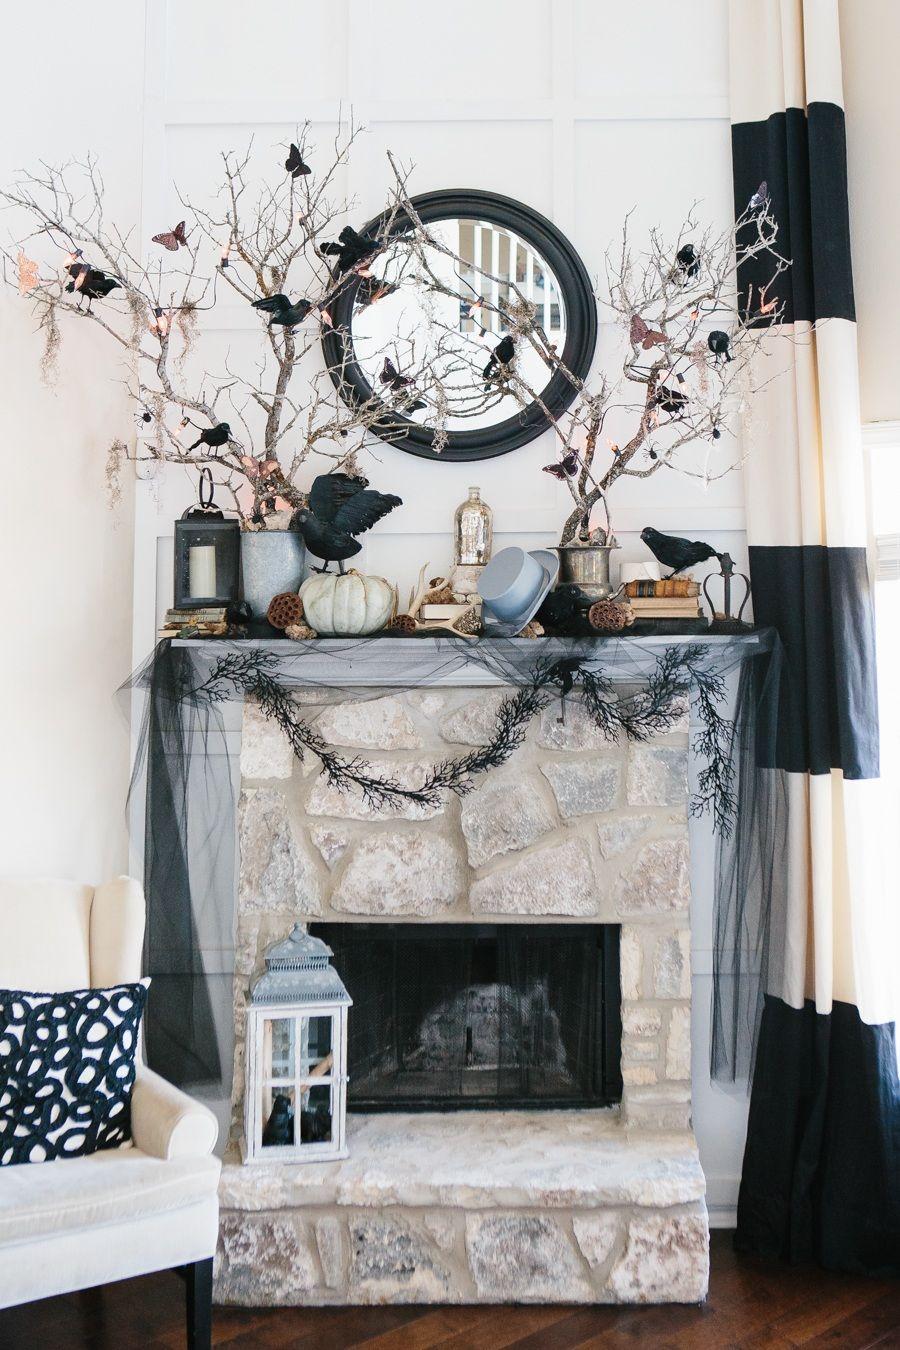 20 Creative Halloween Decorating Ideas Classy Halloween Decor Halloween Decorations Indoor Halloween Living Room